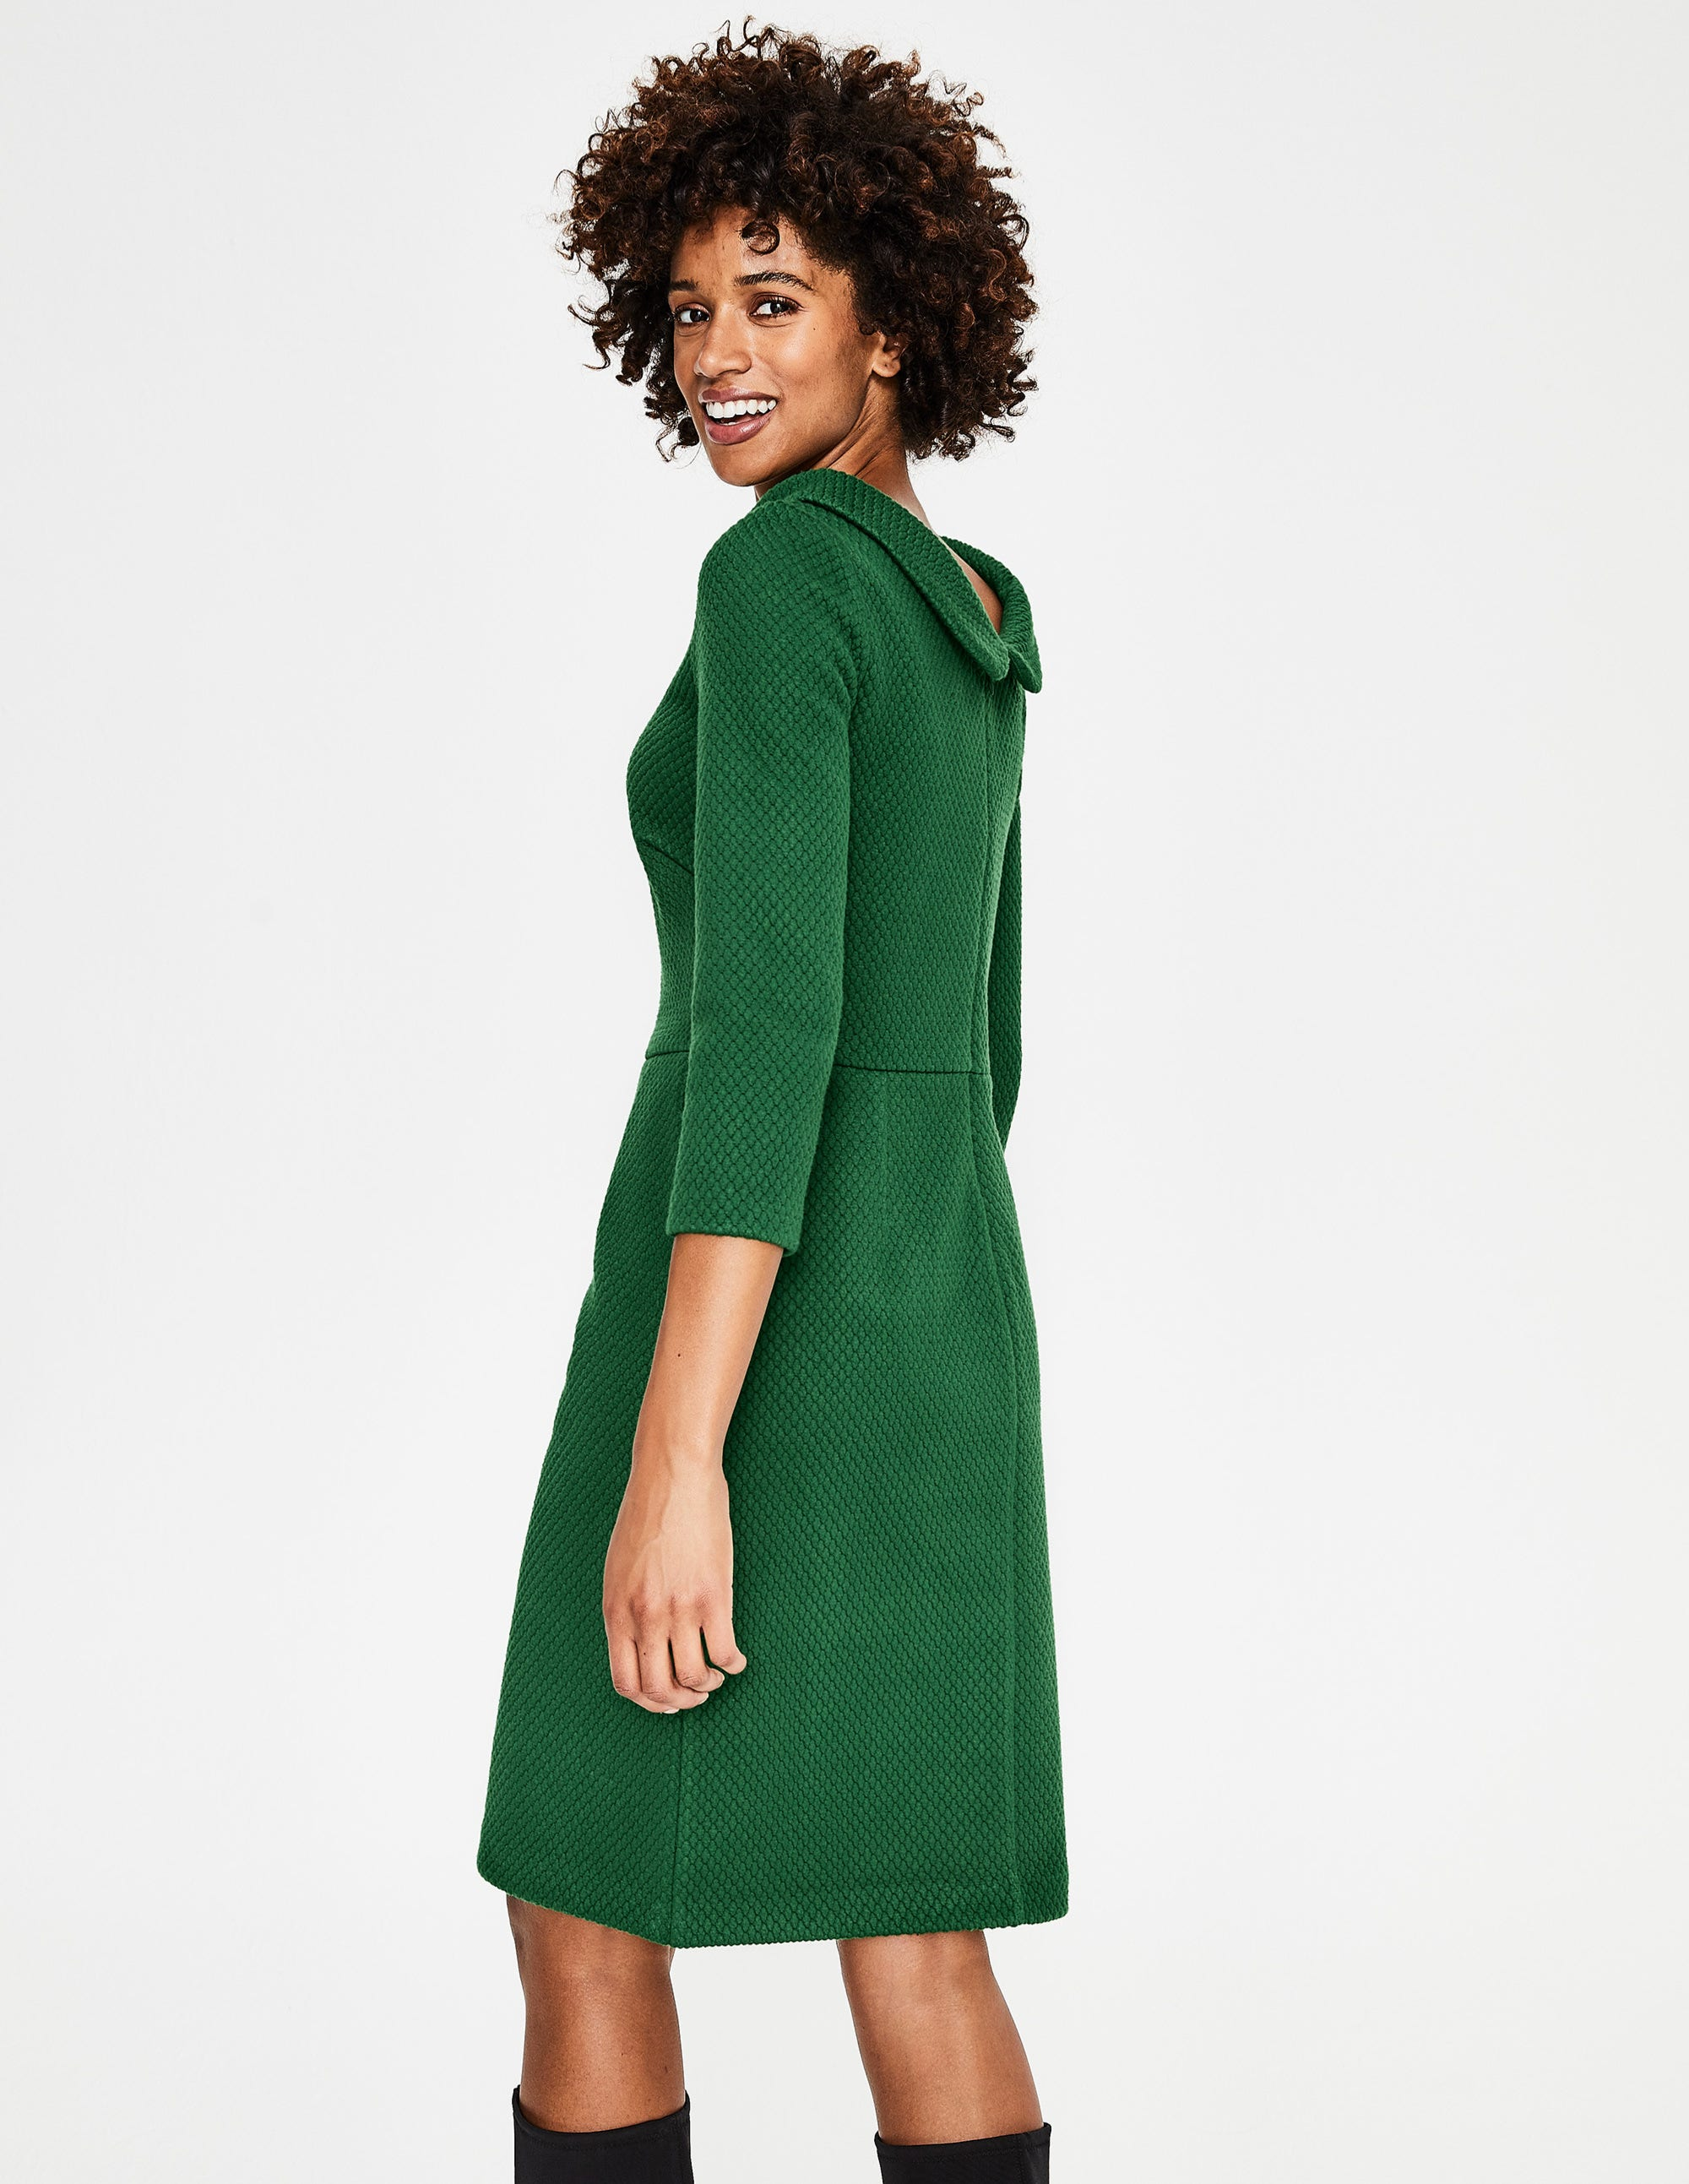 079684603ca83 Estella Jacquard Dress - Amazon Green | Boden AU